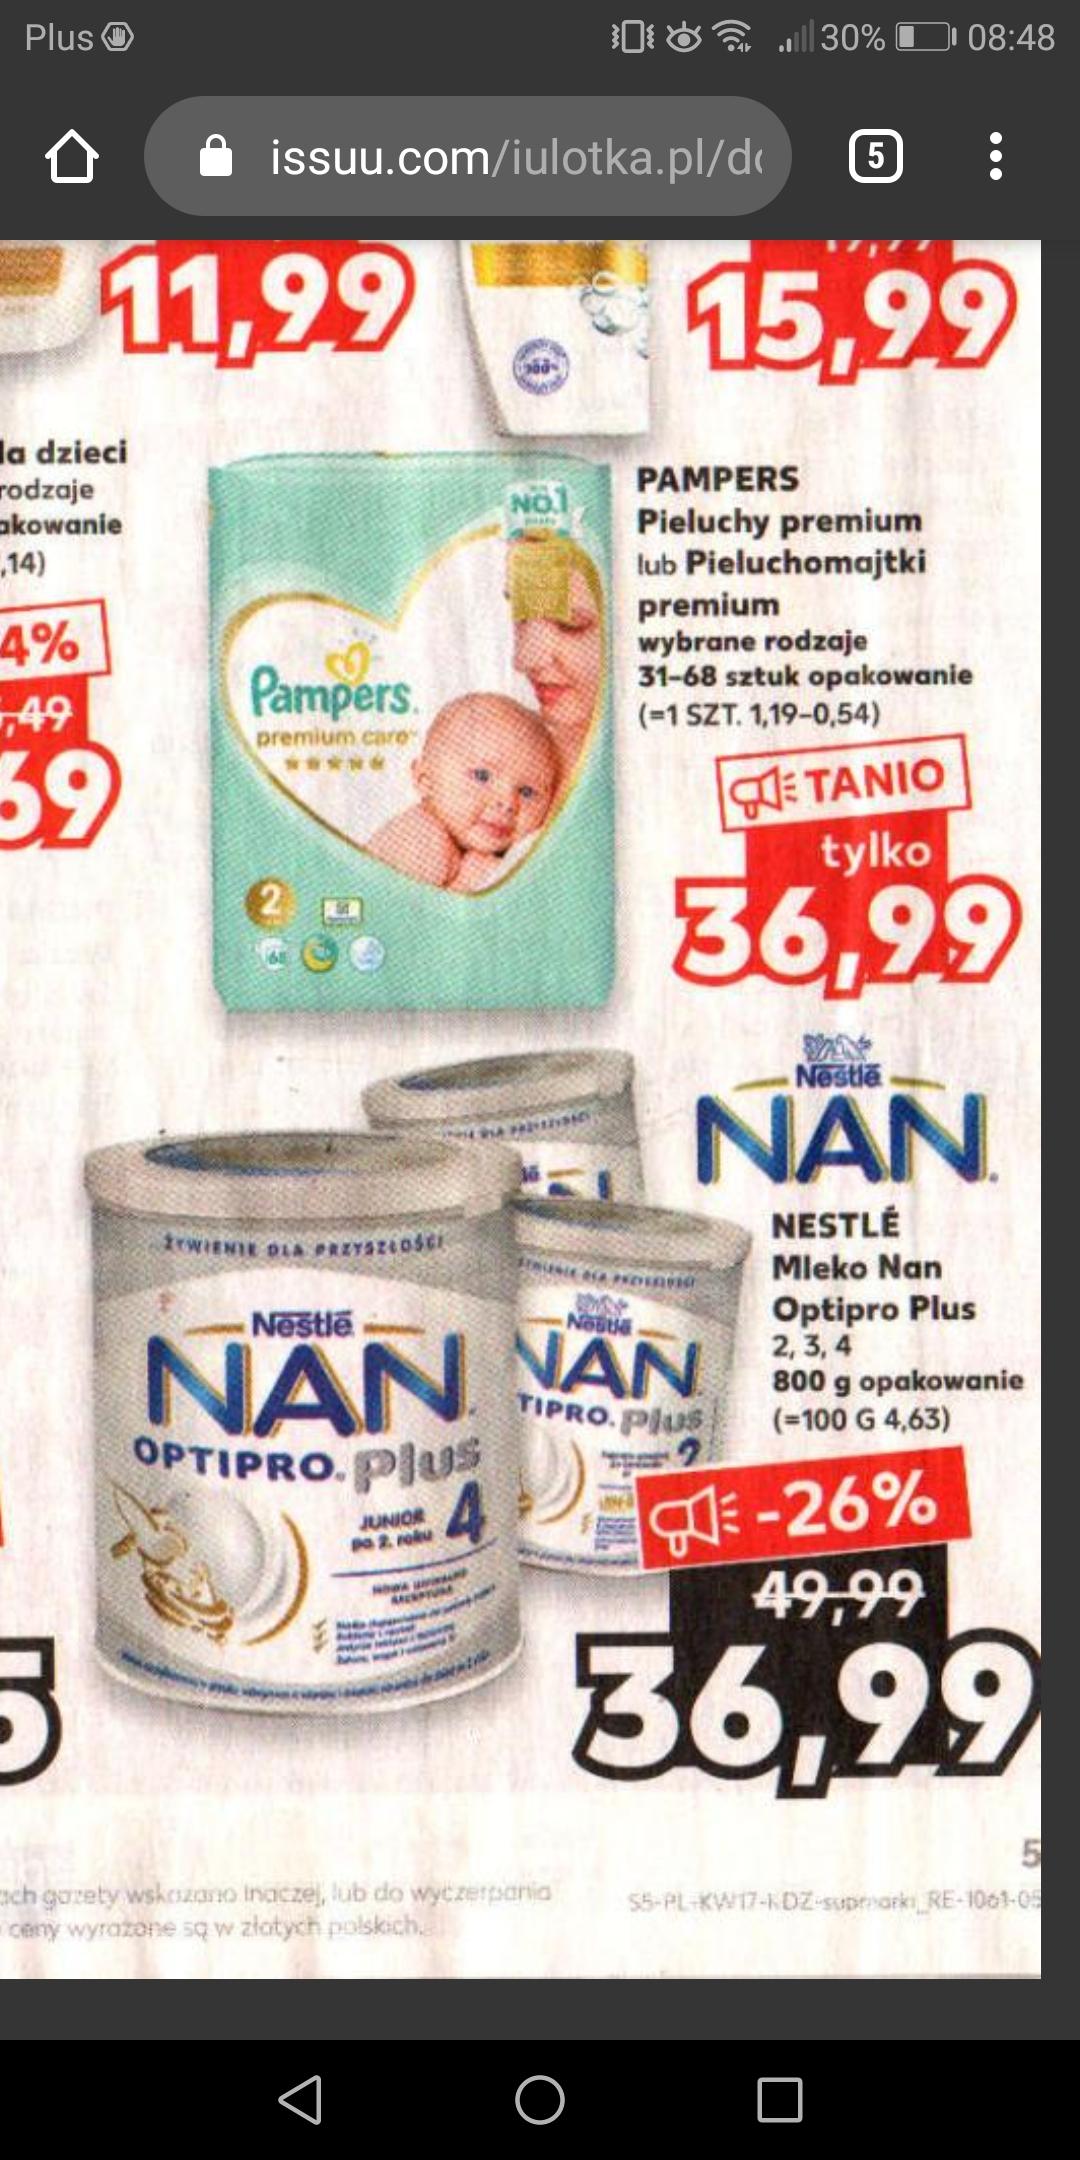 Kaufland Nan optipro plus ; Pampers premium care